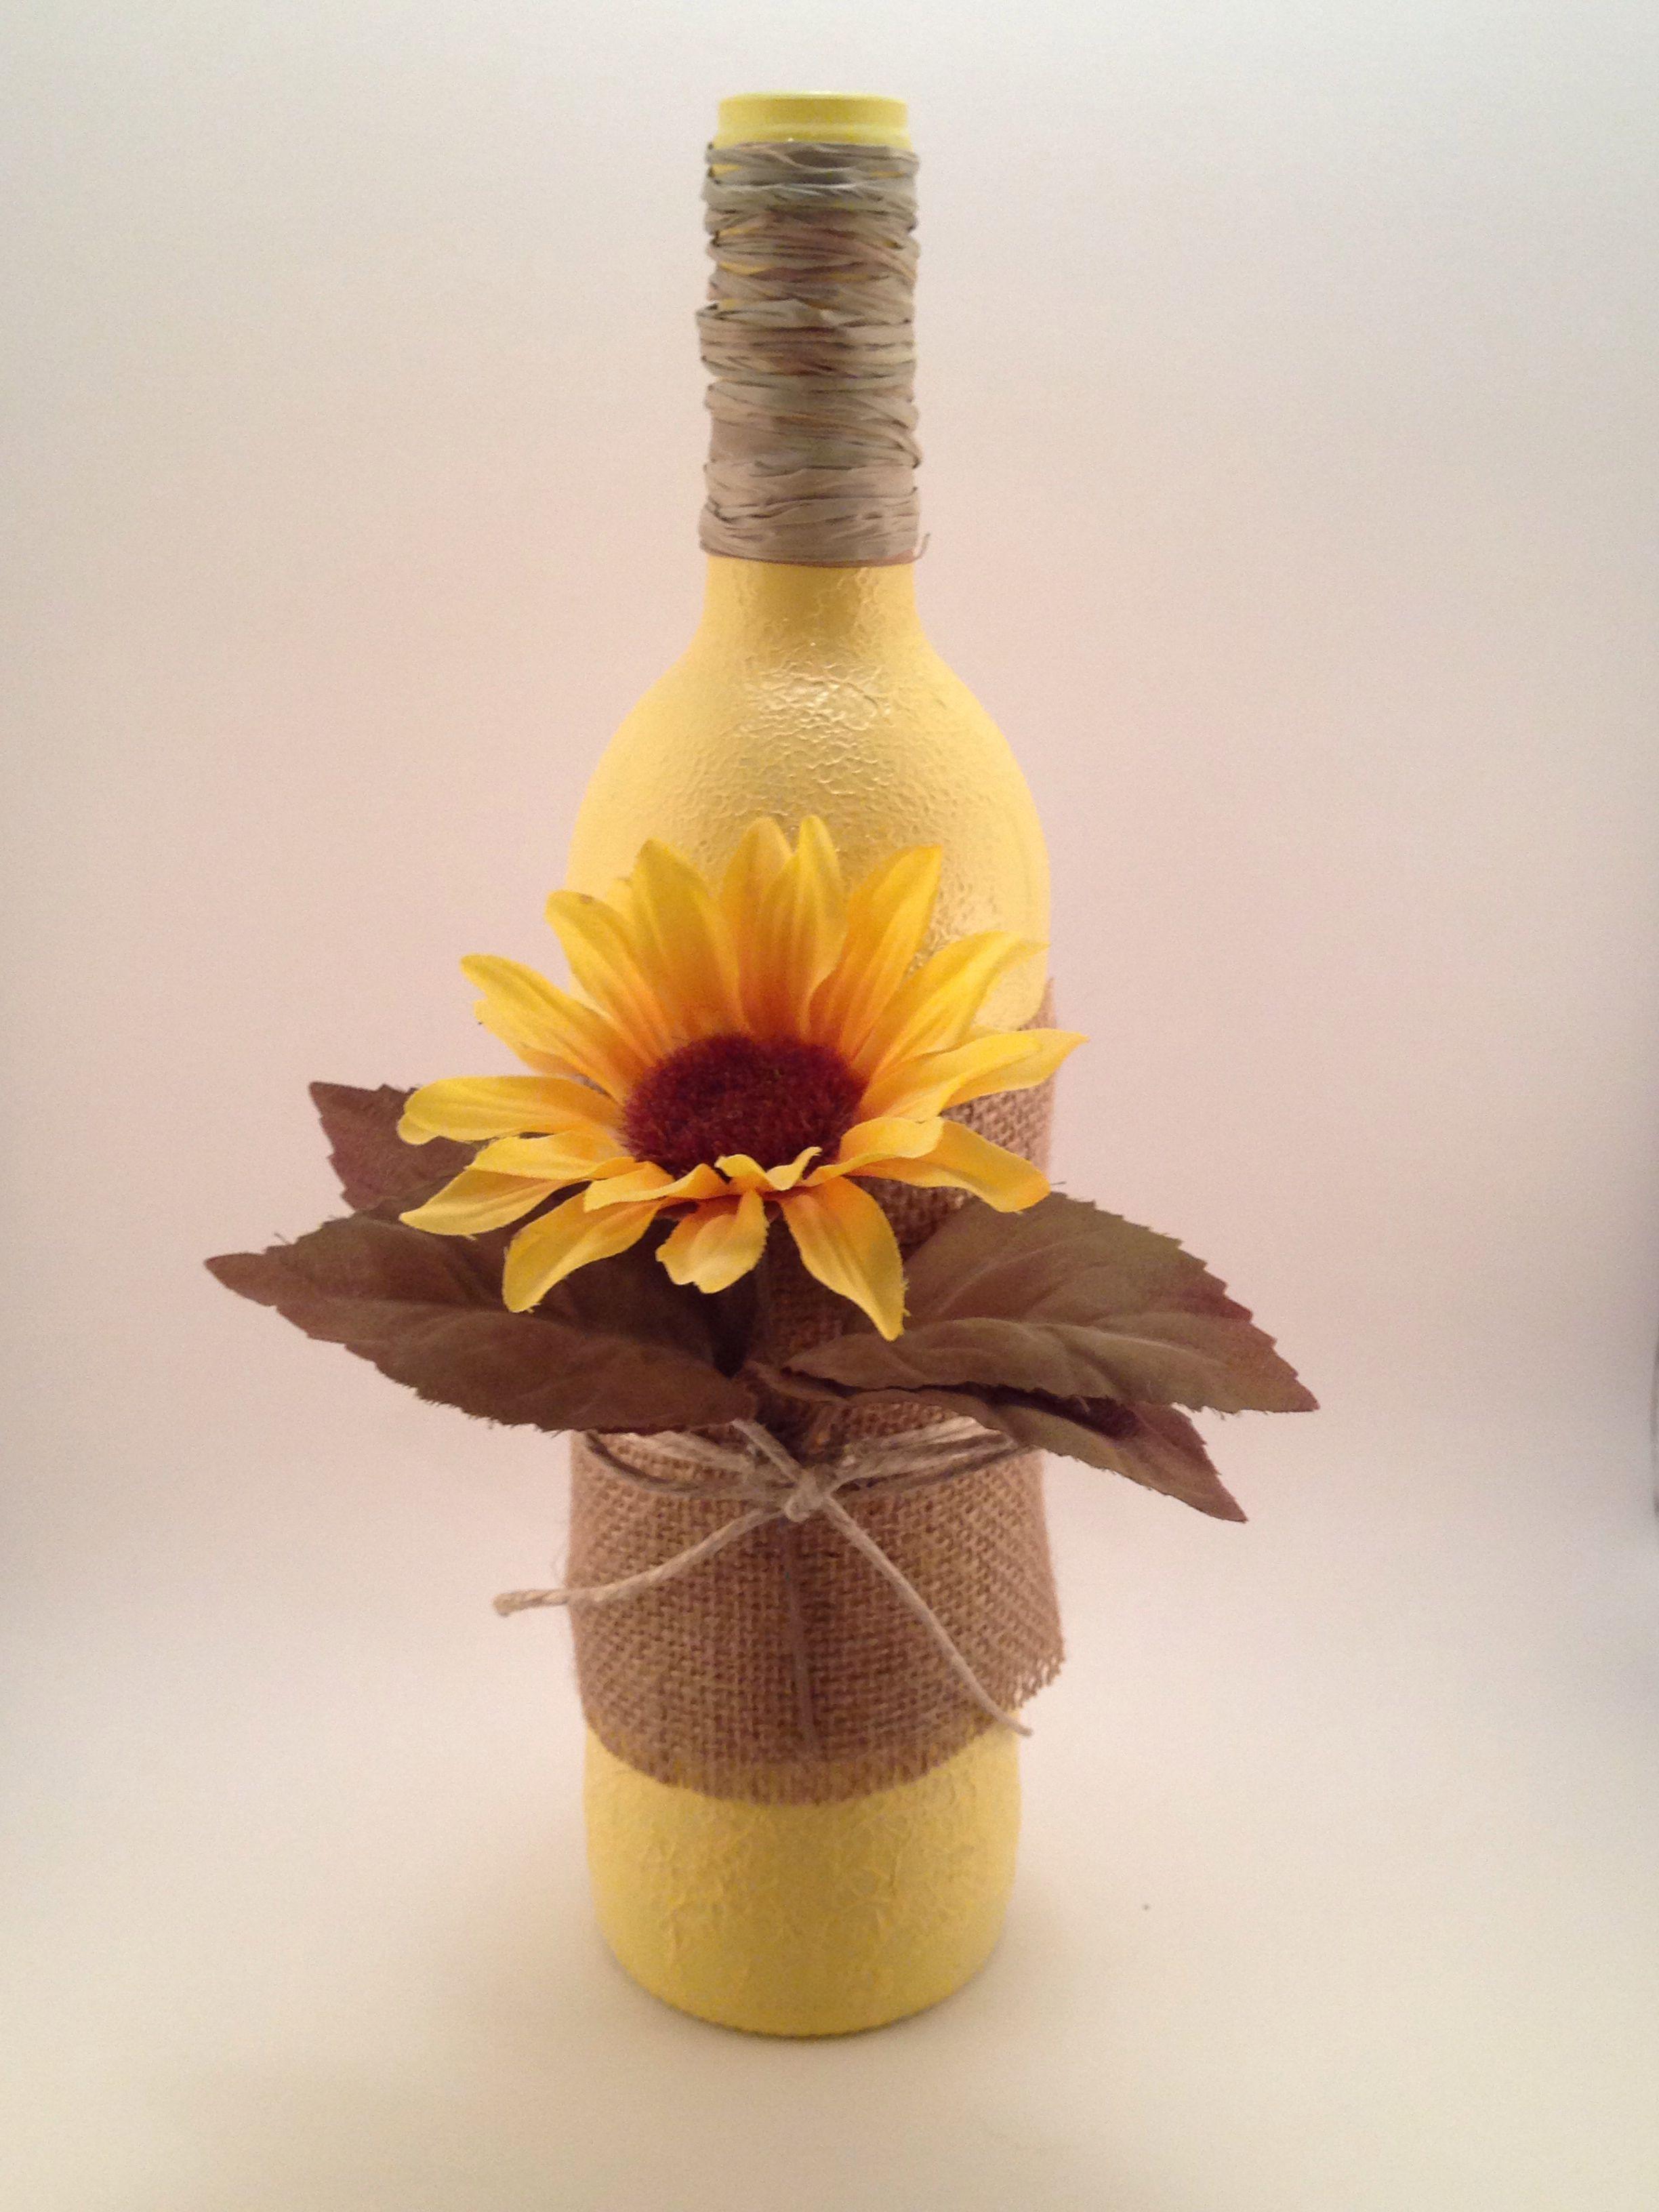 Sunflower Hand Painted Wine Bottle Wine Glasses Amp Bottles Pinterest Painted Wine Bottles